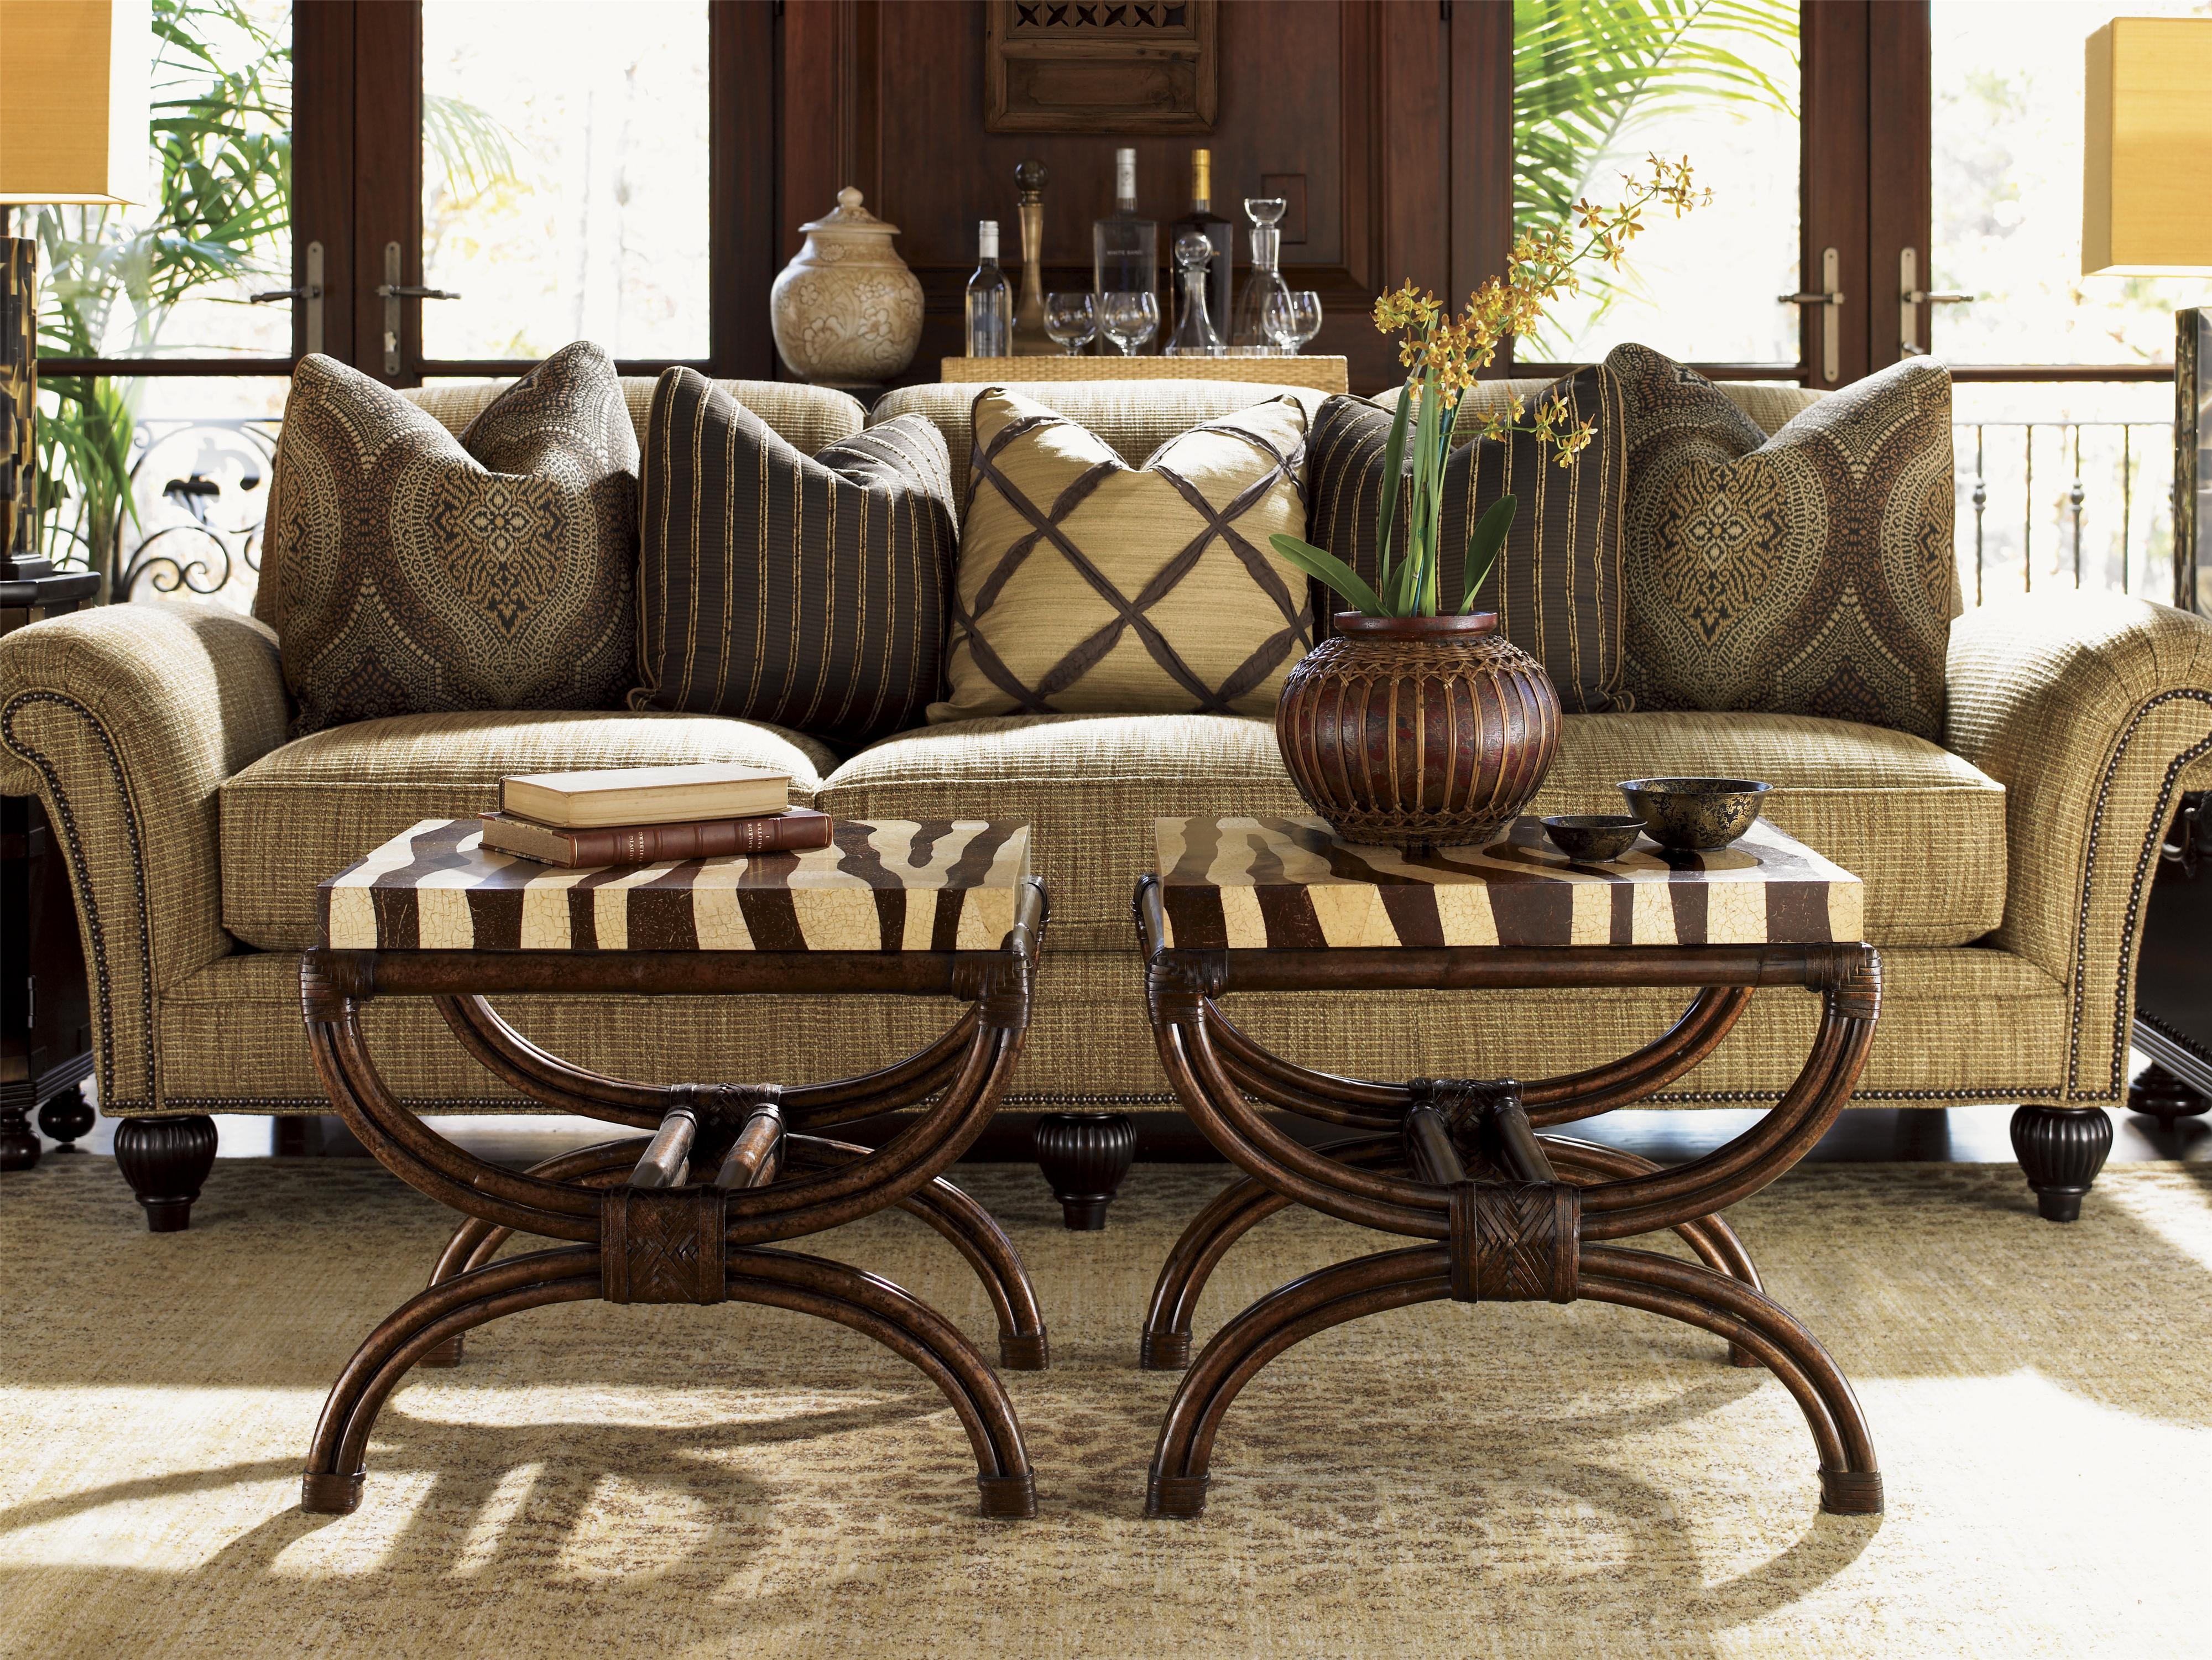 Royal Kahala Fabric By Tommy Bahama Home Baer 39 S Furniture Tommy Bahama Home Royal Kahala